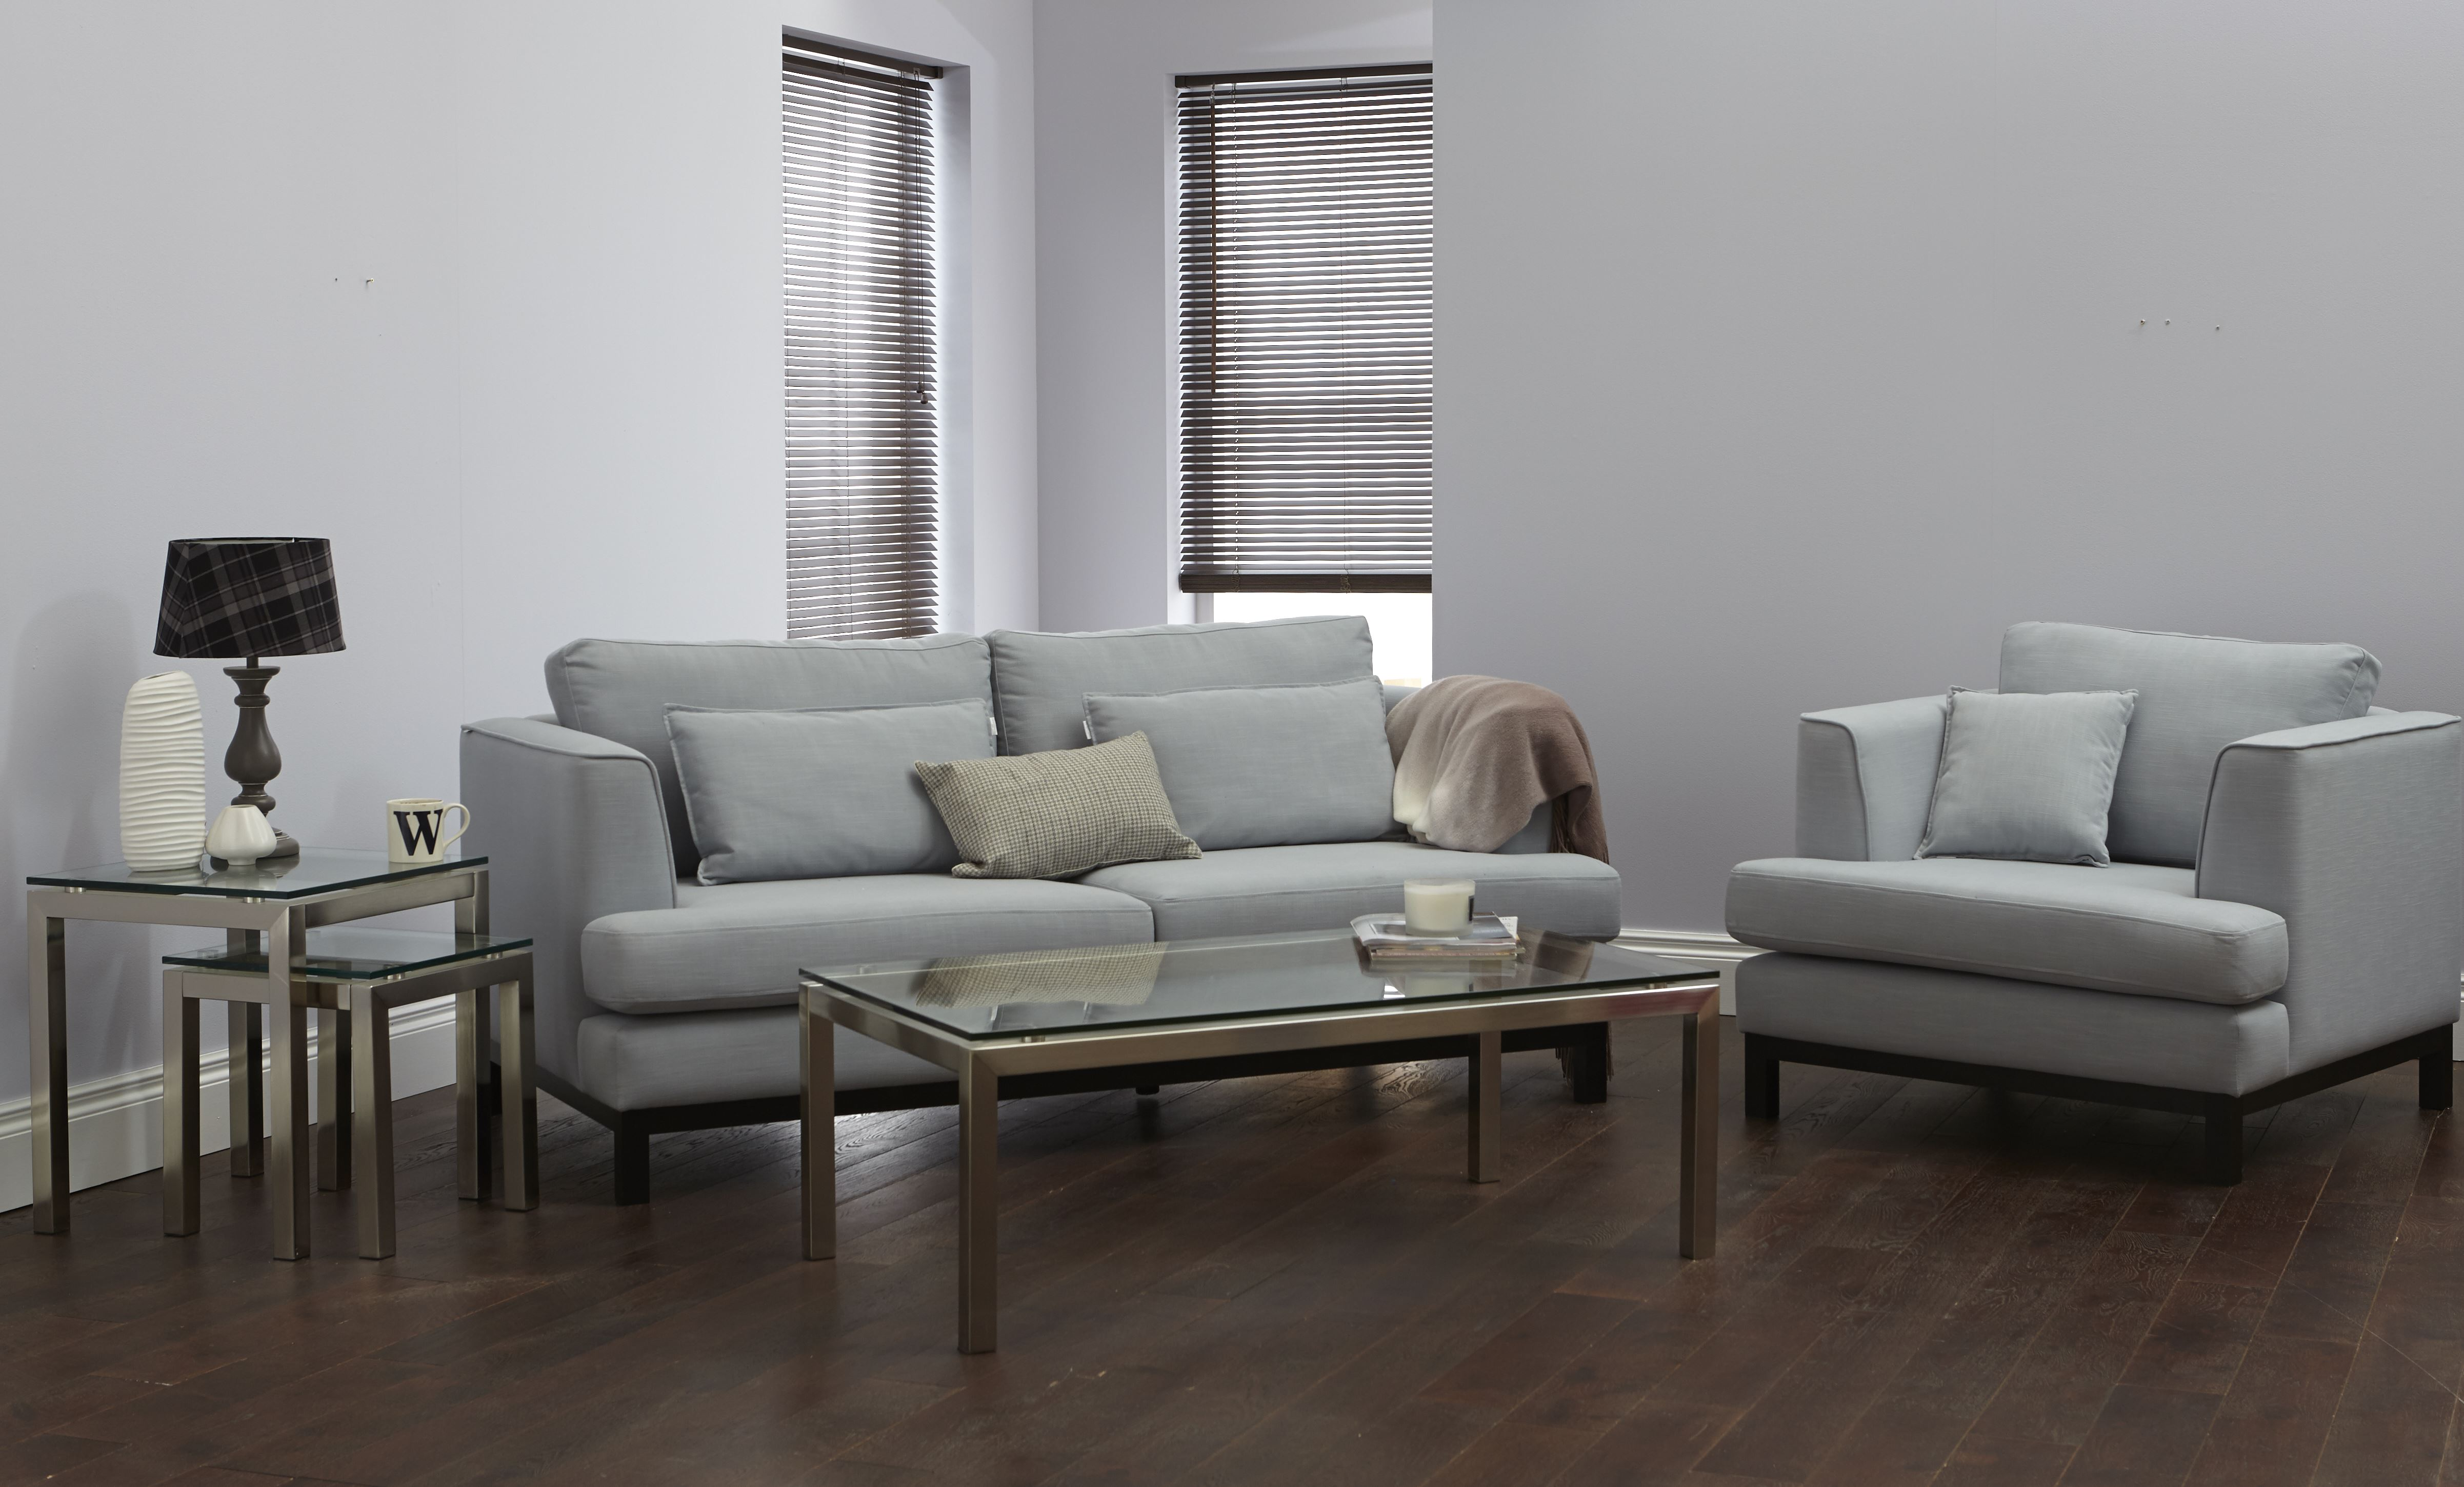 squashy sofas uk 399 sofa so good the treasure hunter well designed